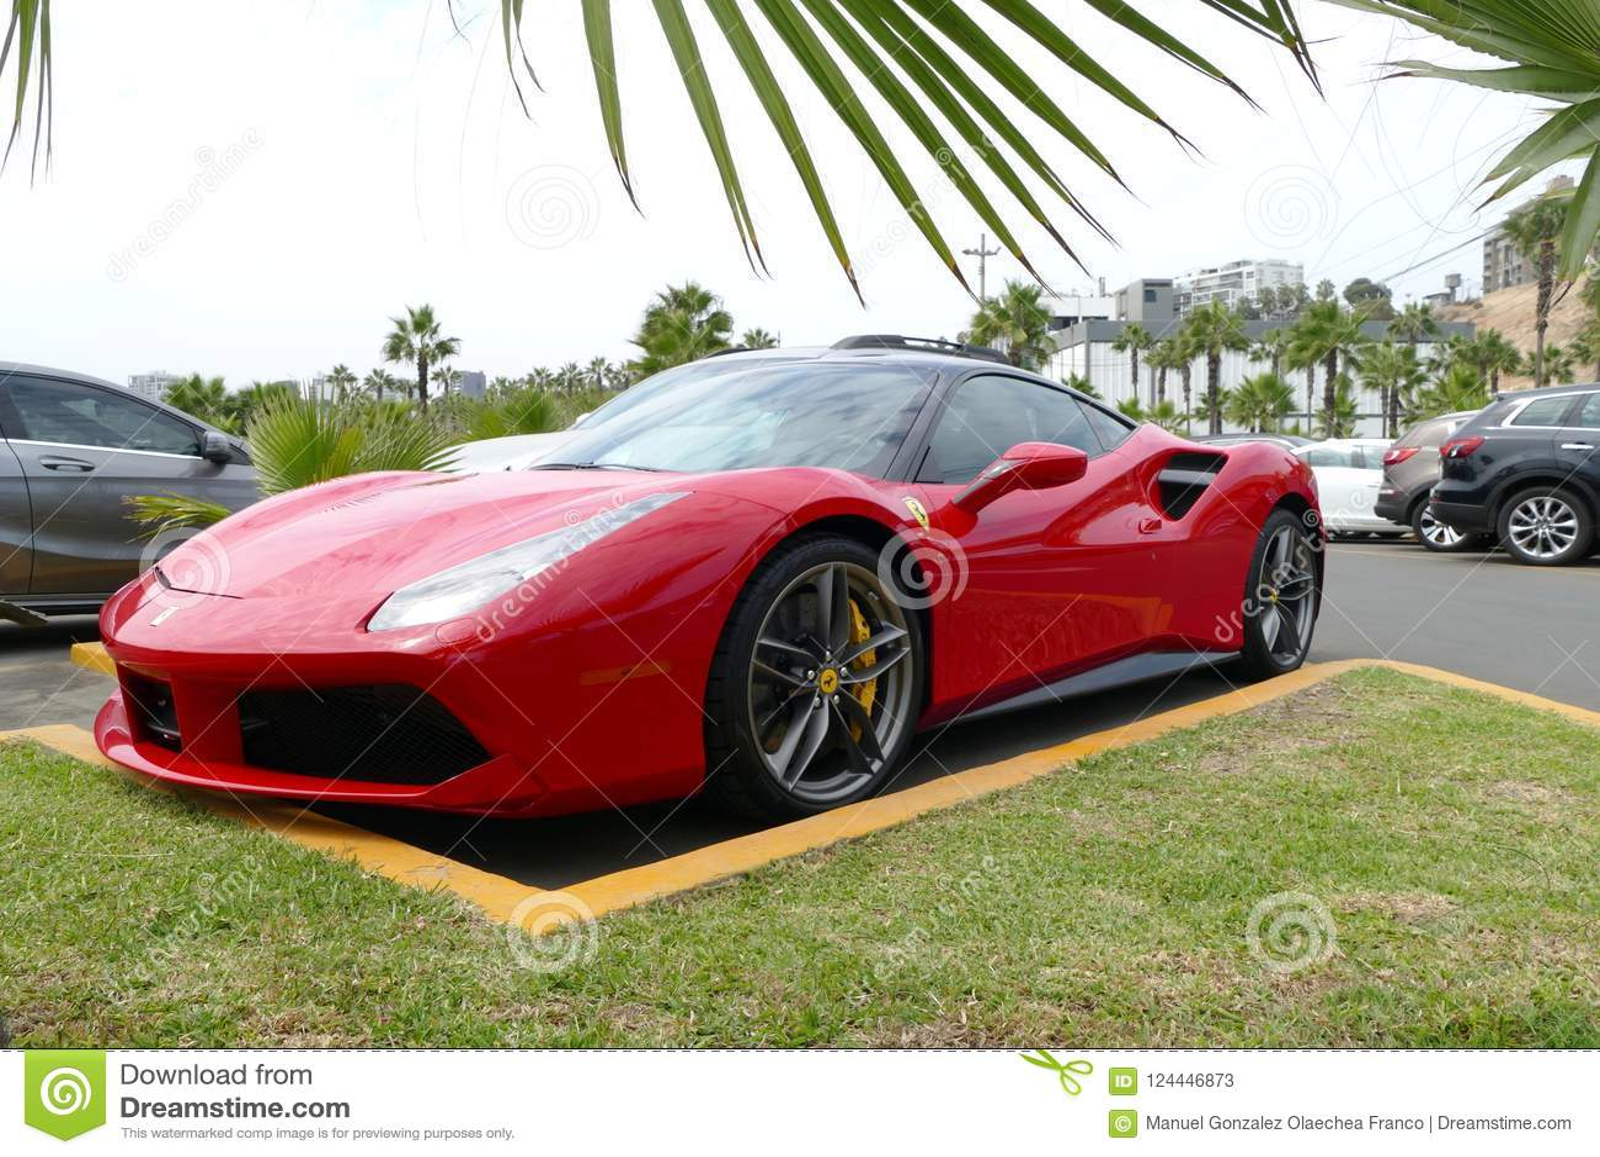 Red And Black Ferrari 488 Gtb In Chorrillos Lima Editorial Stock Photo Image Of America Fast 124446873